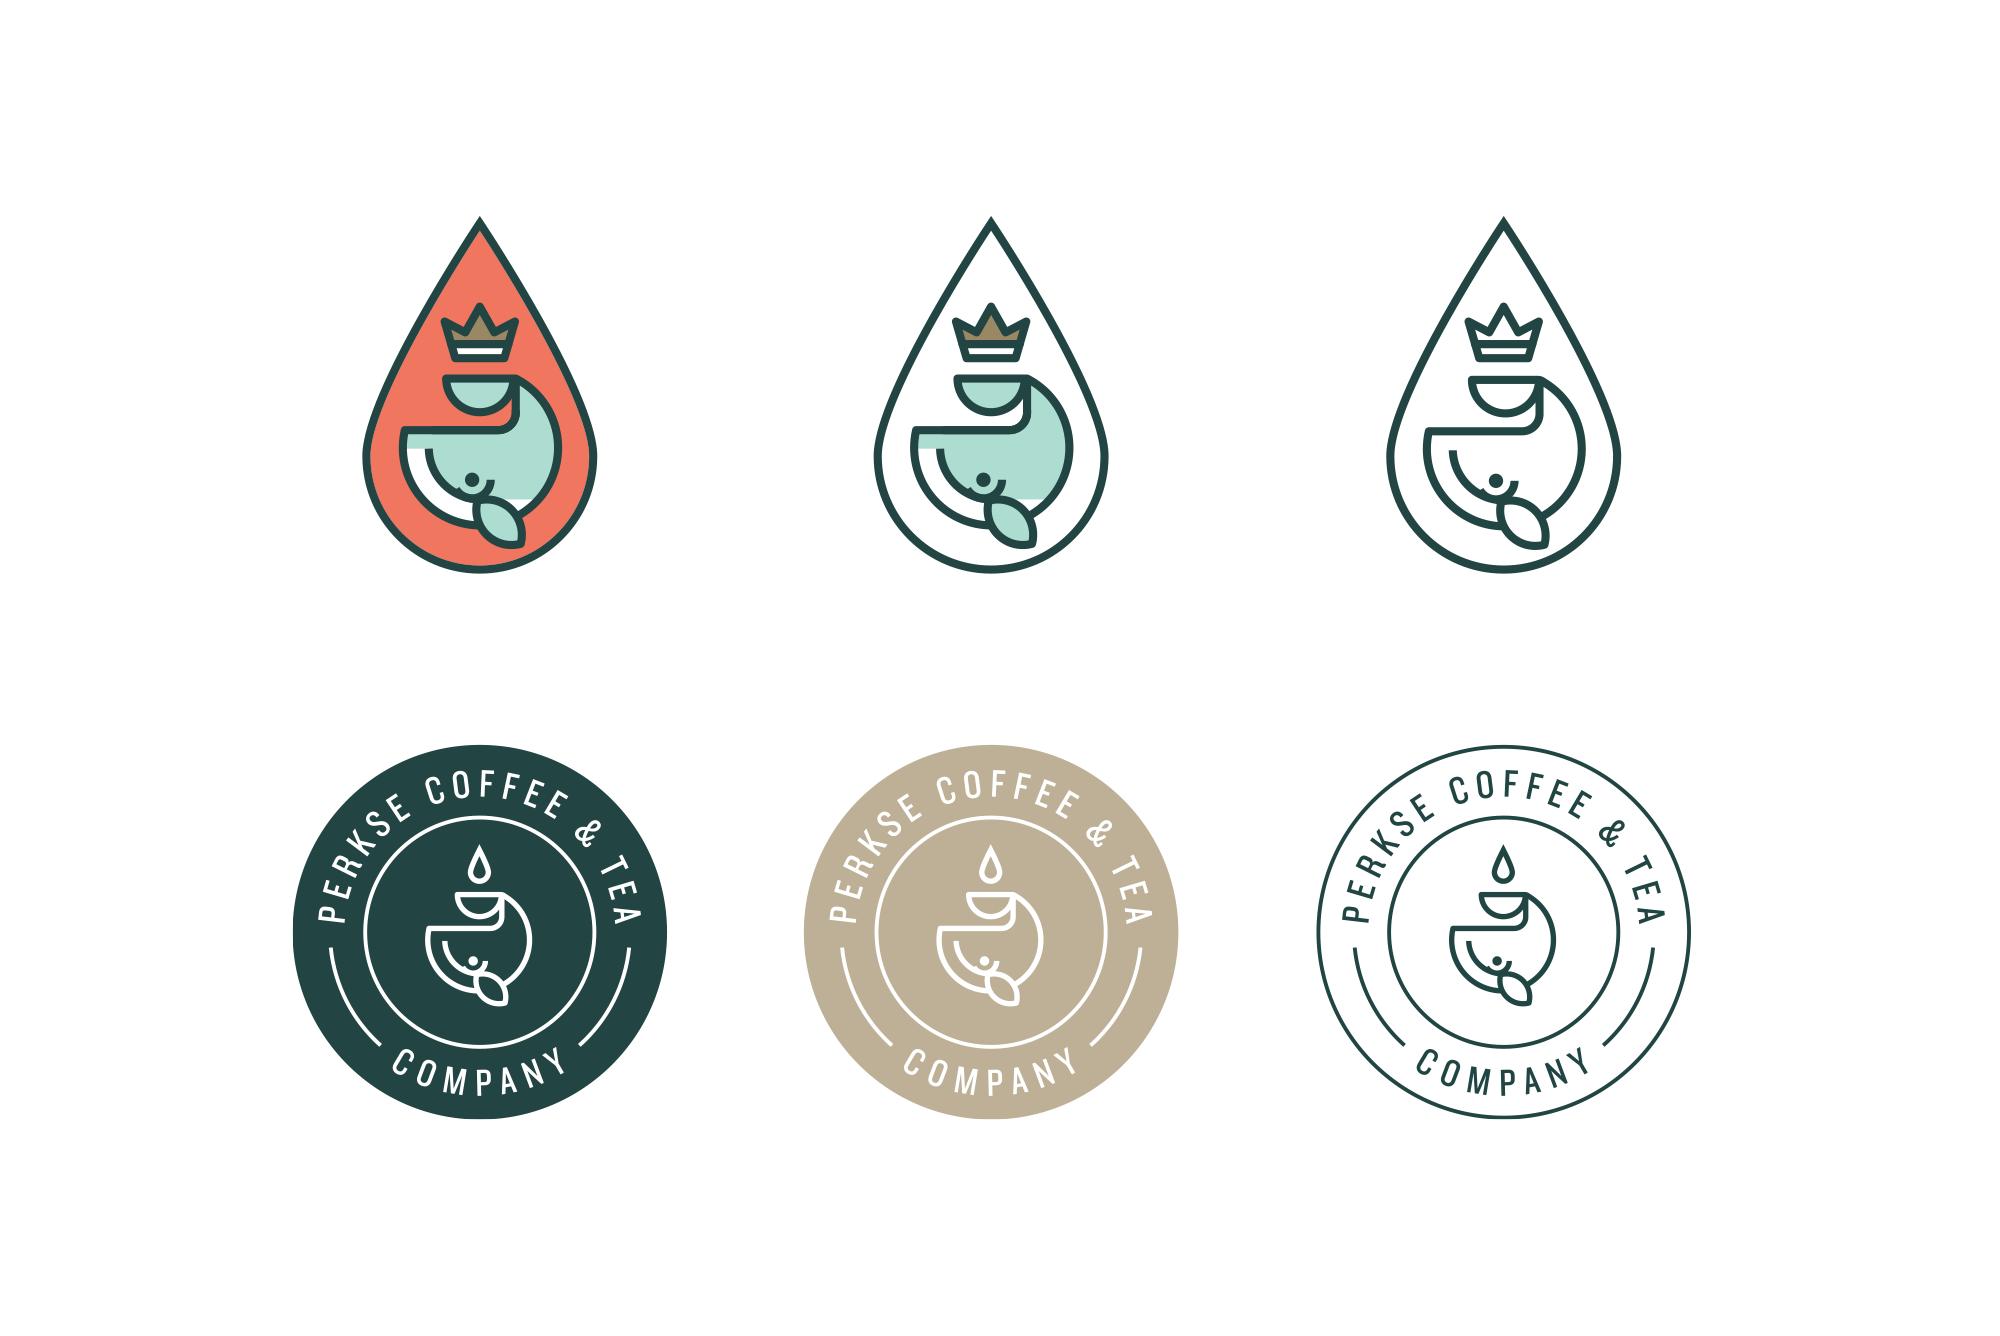 Perkse logos